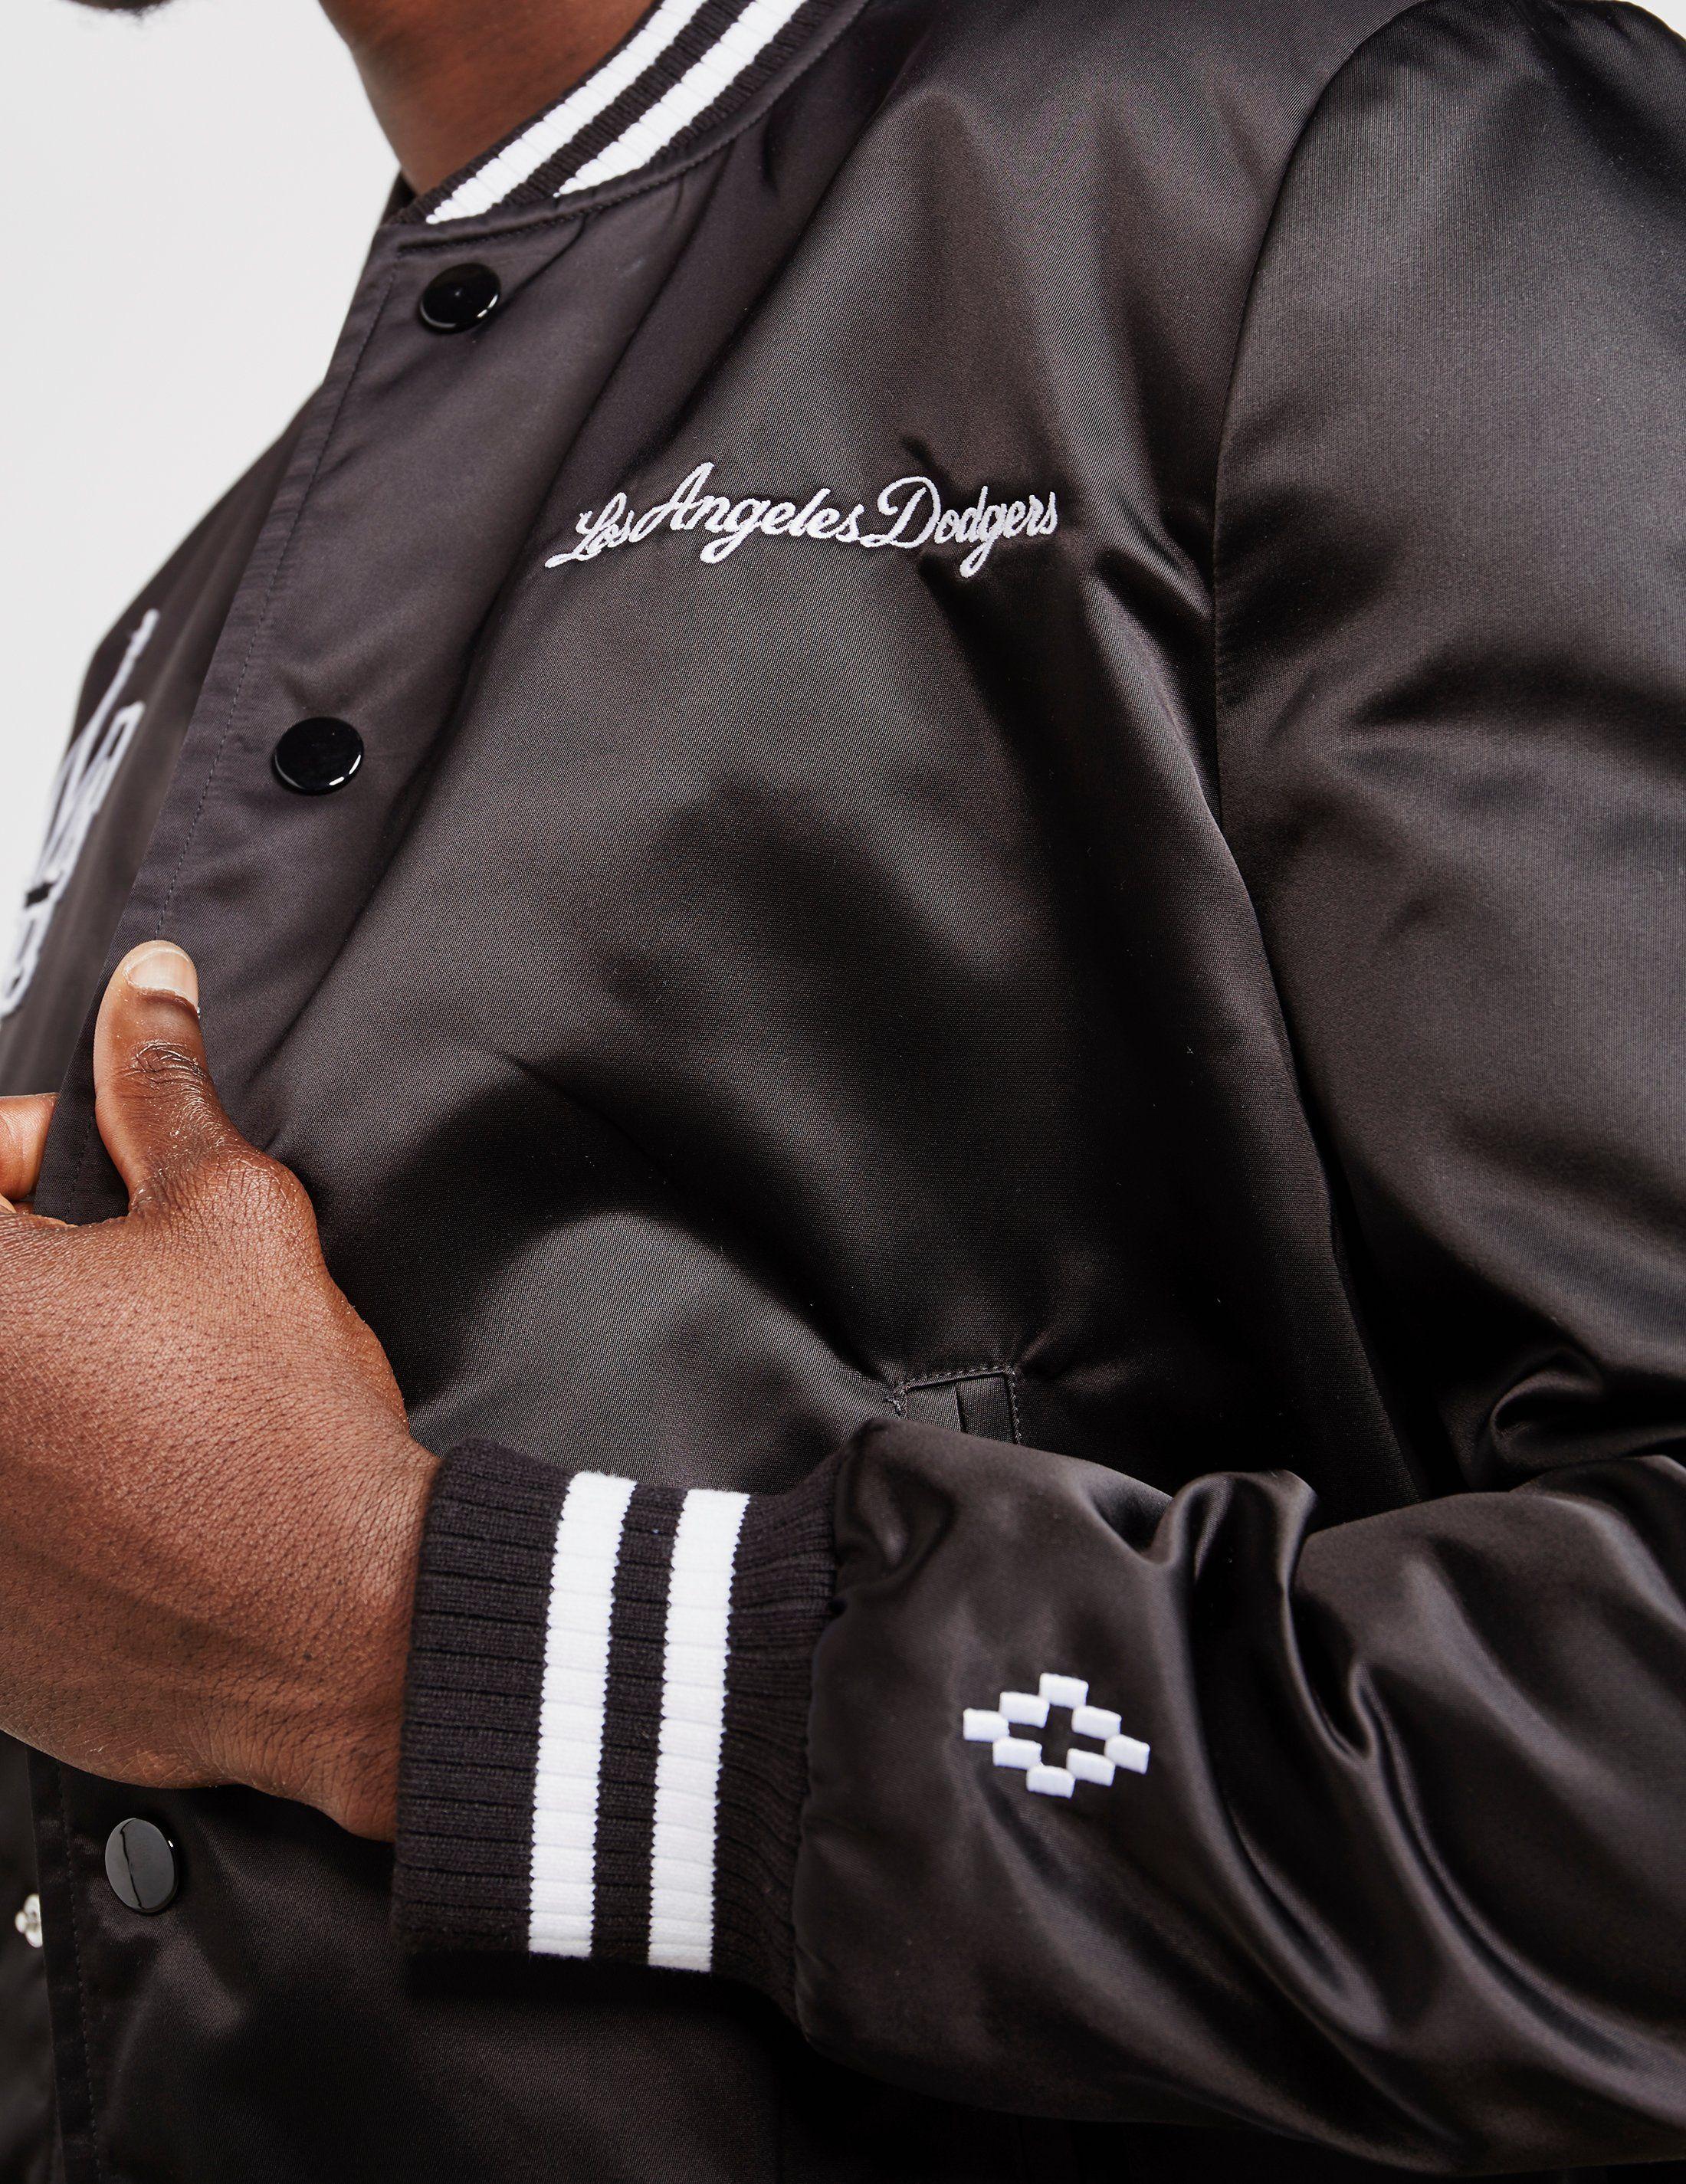 Marcelo Burlon LA Dodgers Bomber Jacket - Online Exclusive